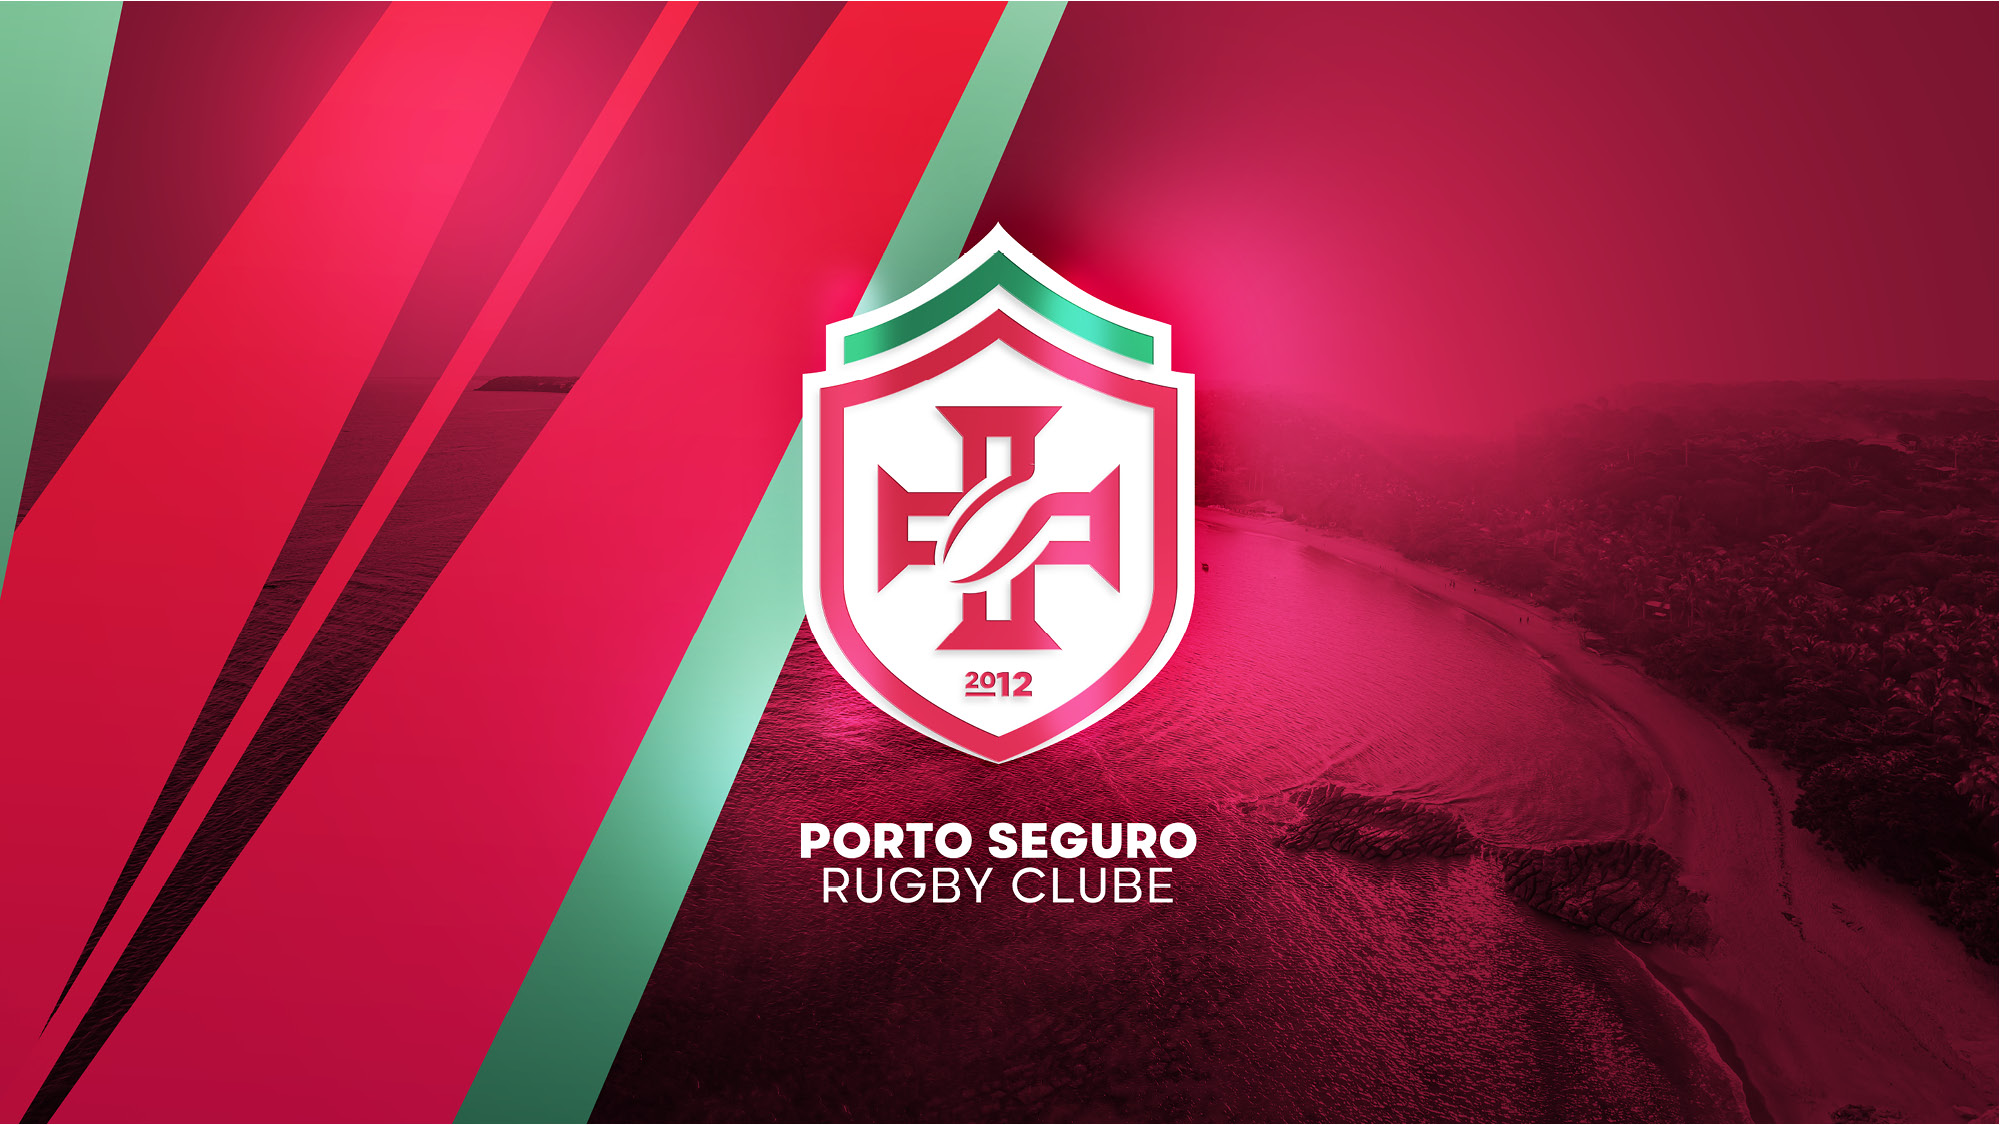 Porto-Seguro-Rugby-Clube-Brand-Identity-Presentation-2